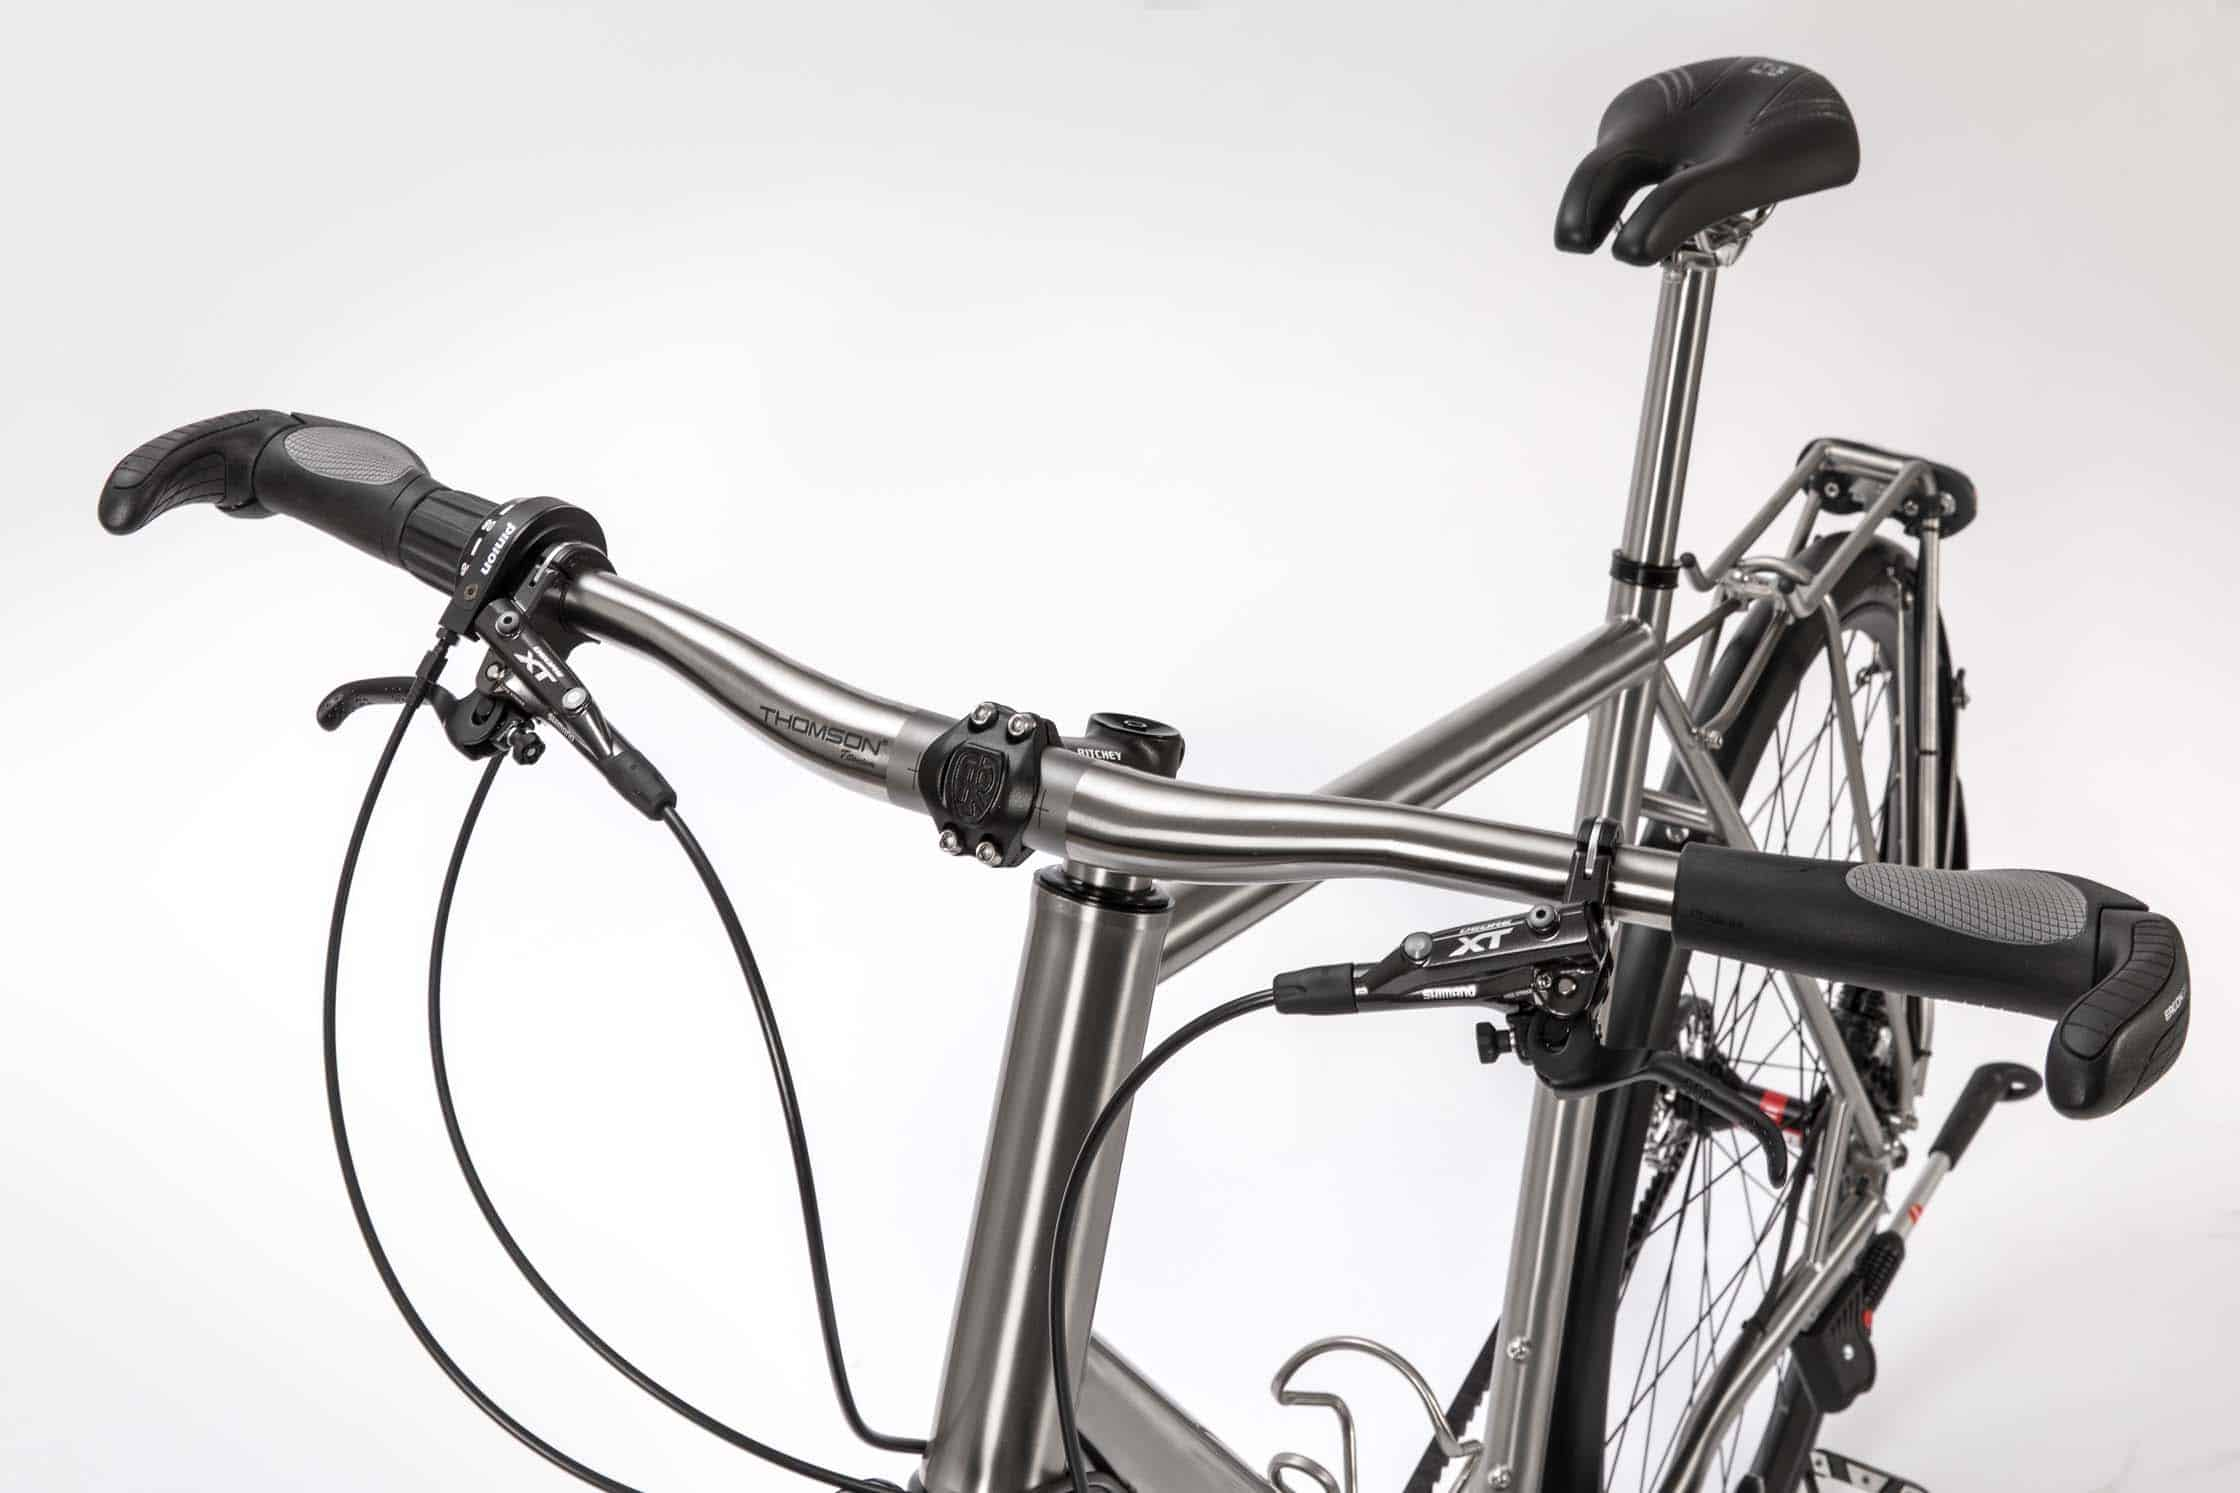 Urban_Pinion_Bike_08_min